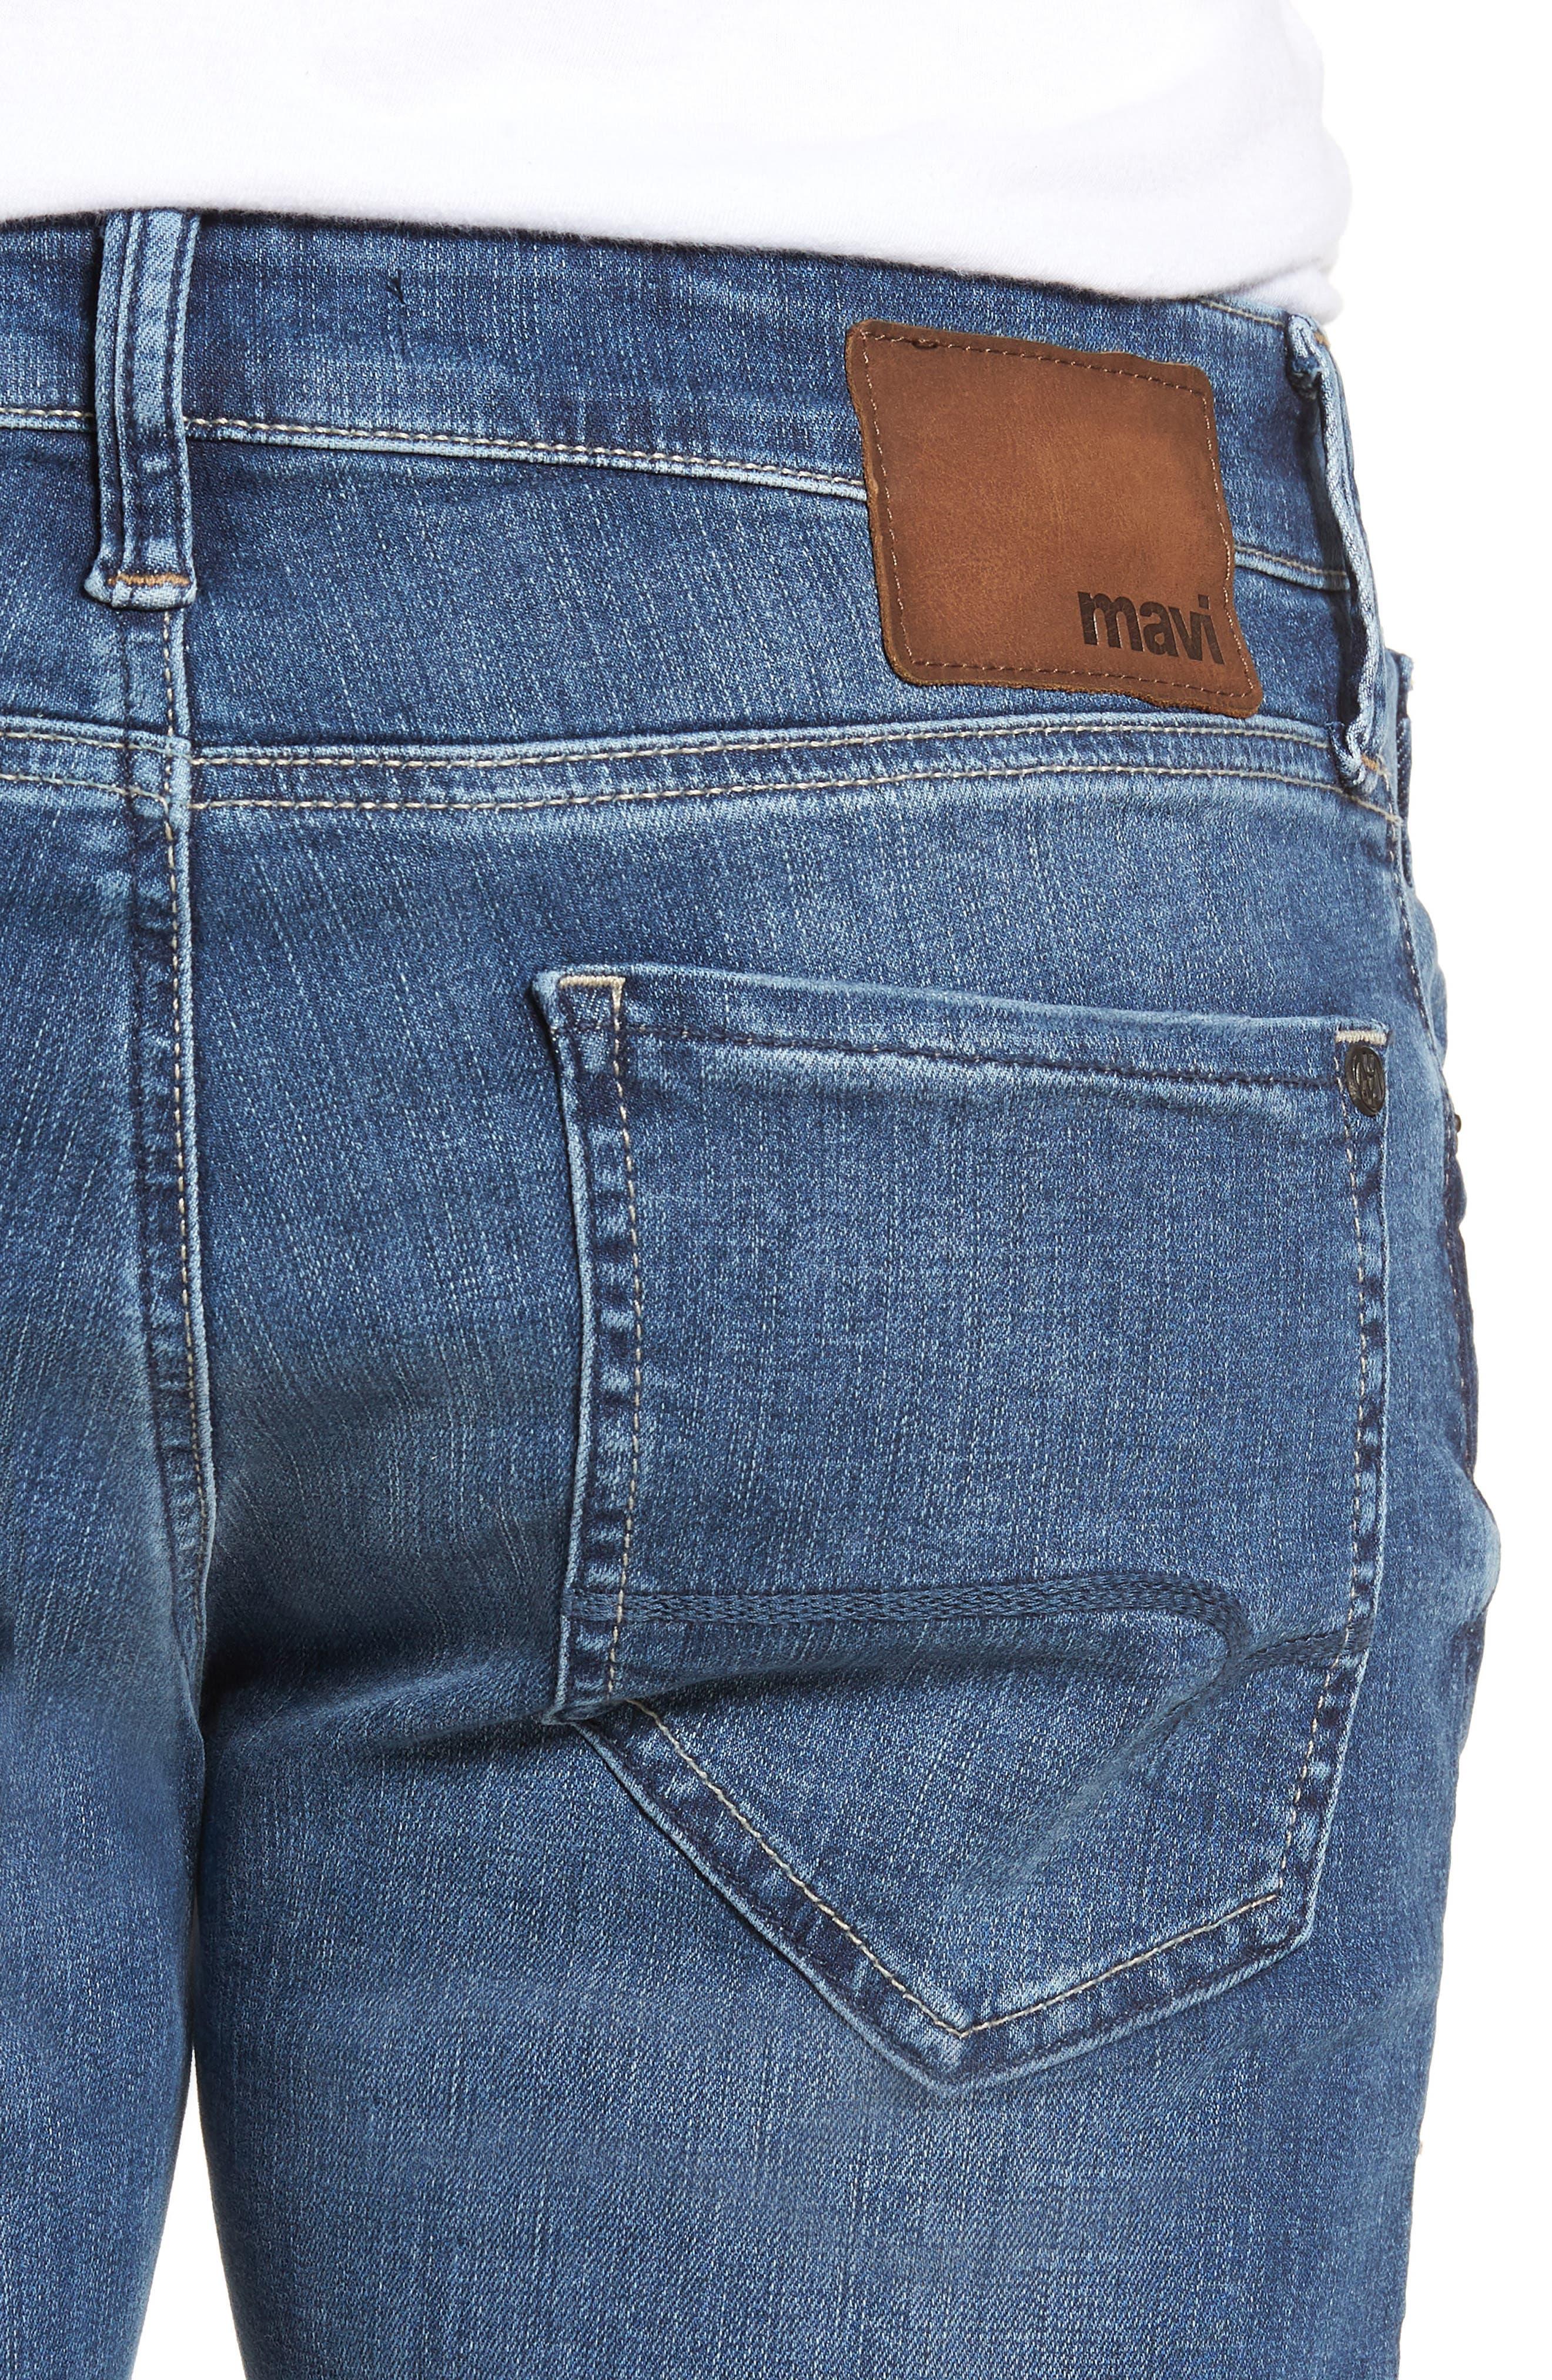 Zach Straight Leg Jeans,                             Alternate thumbnail 4, color,                             Indigo Cashmere